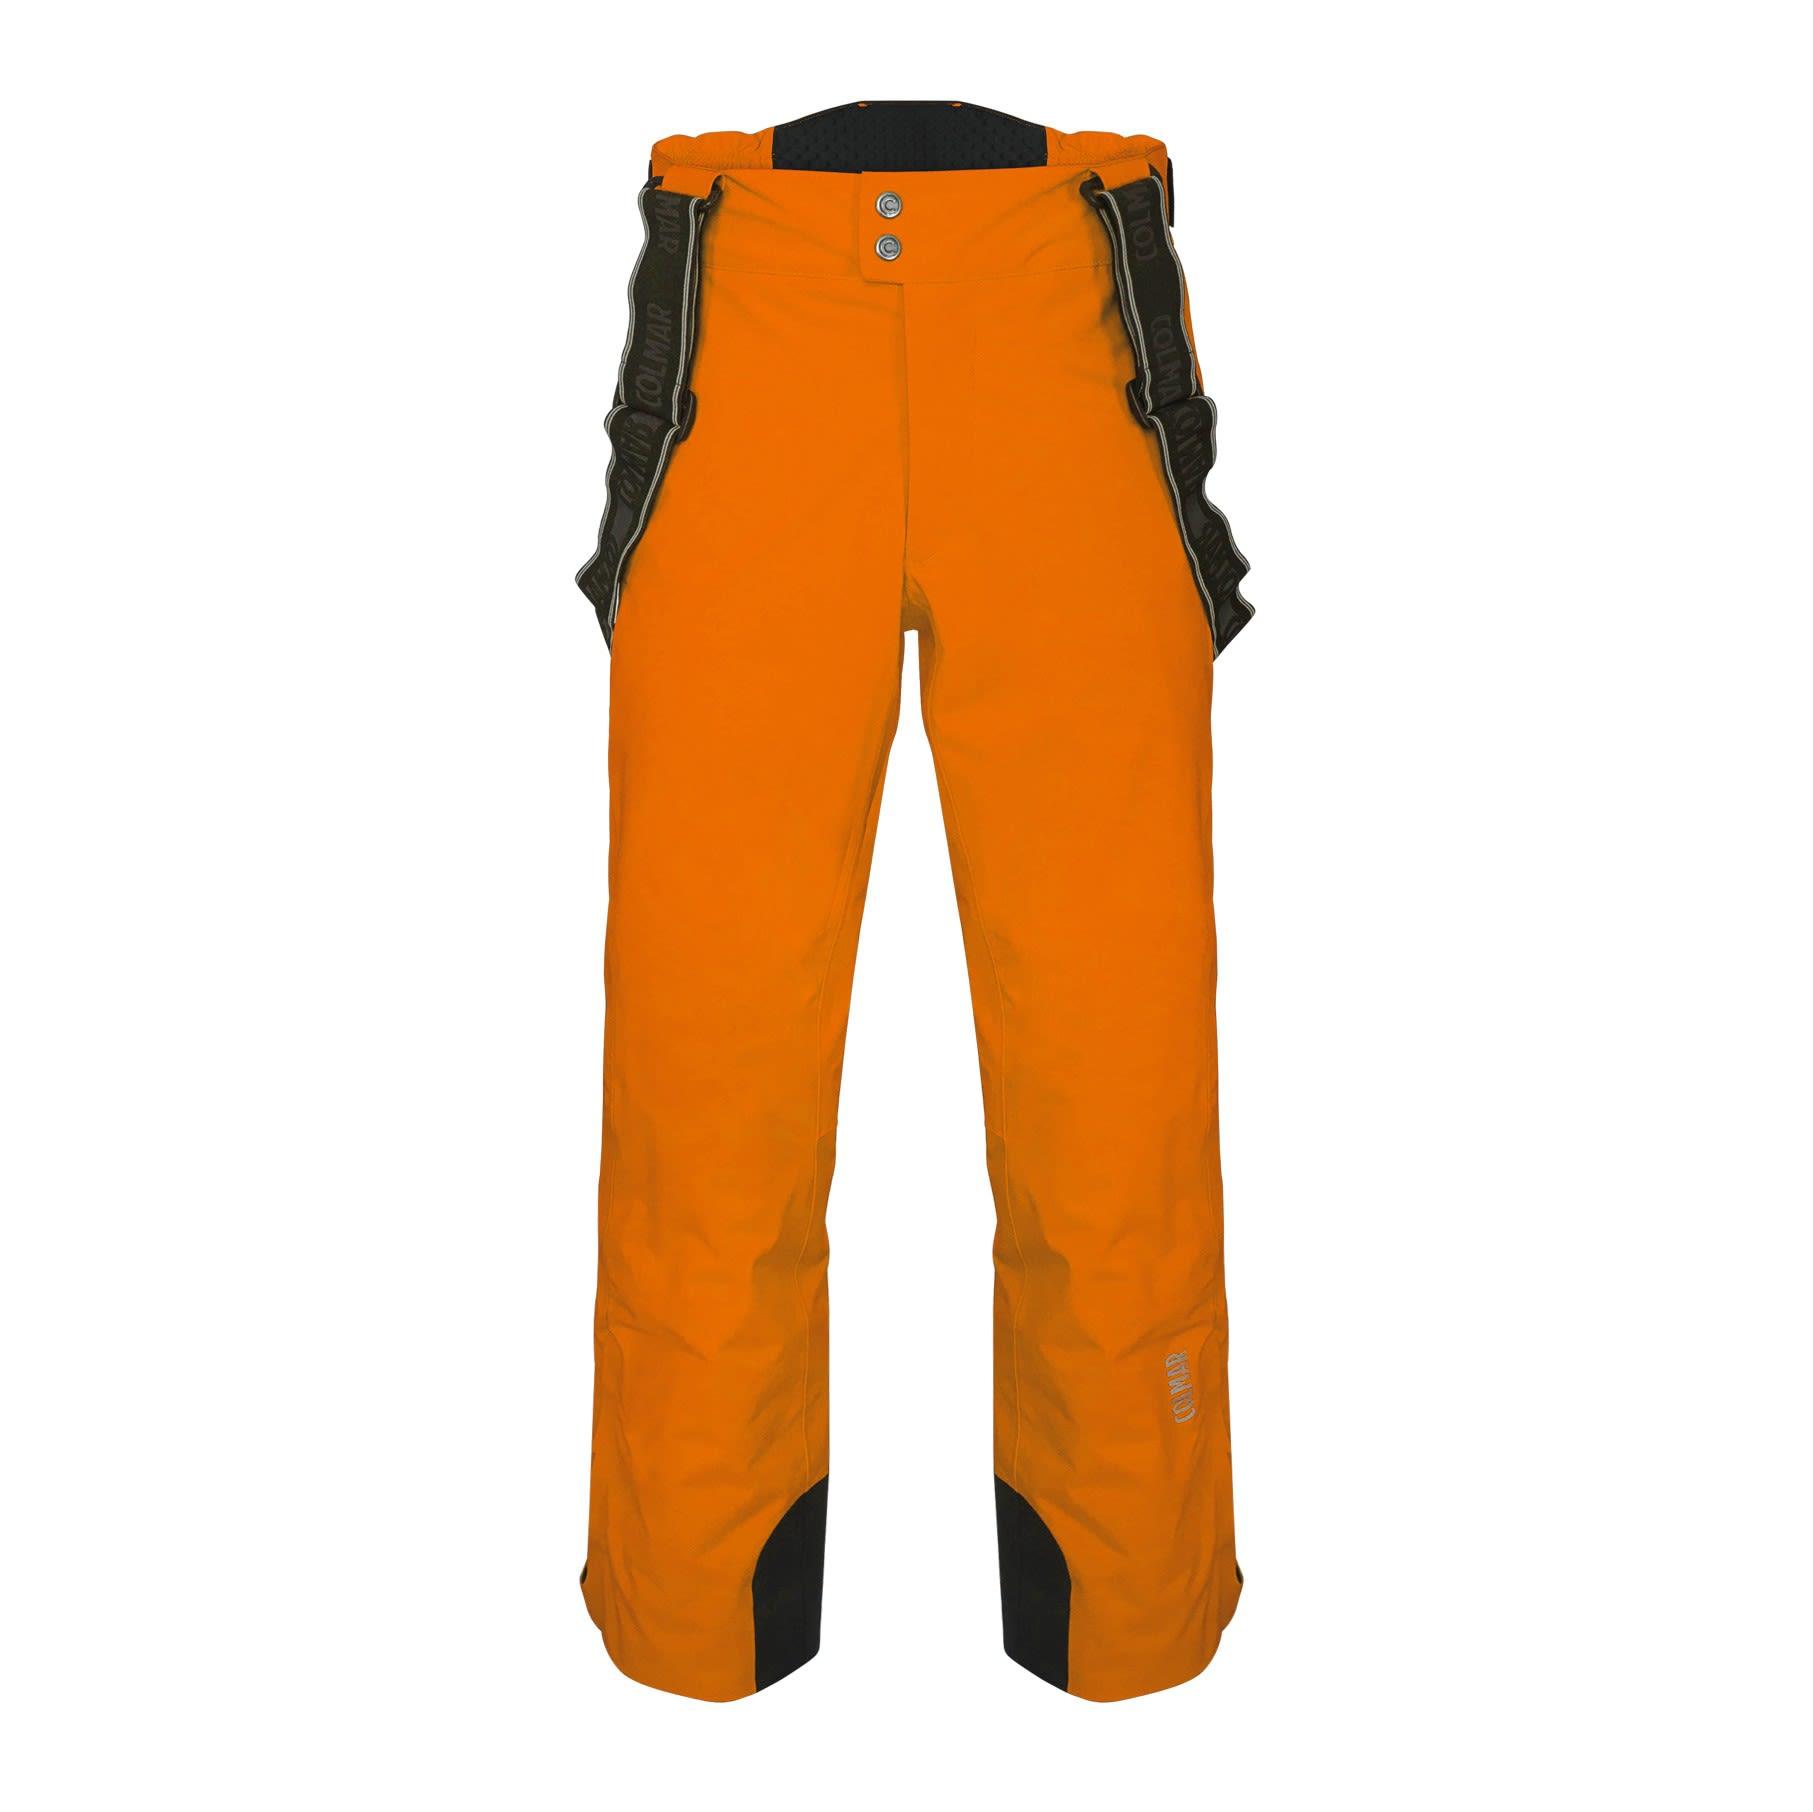 Colmar M Mech Stretch Target Salopette Pants | Herren Hose